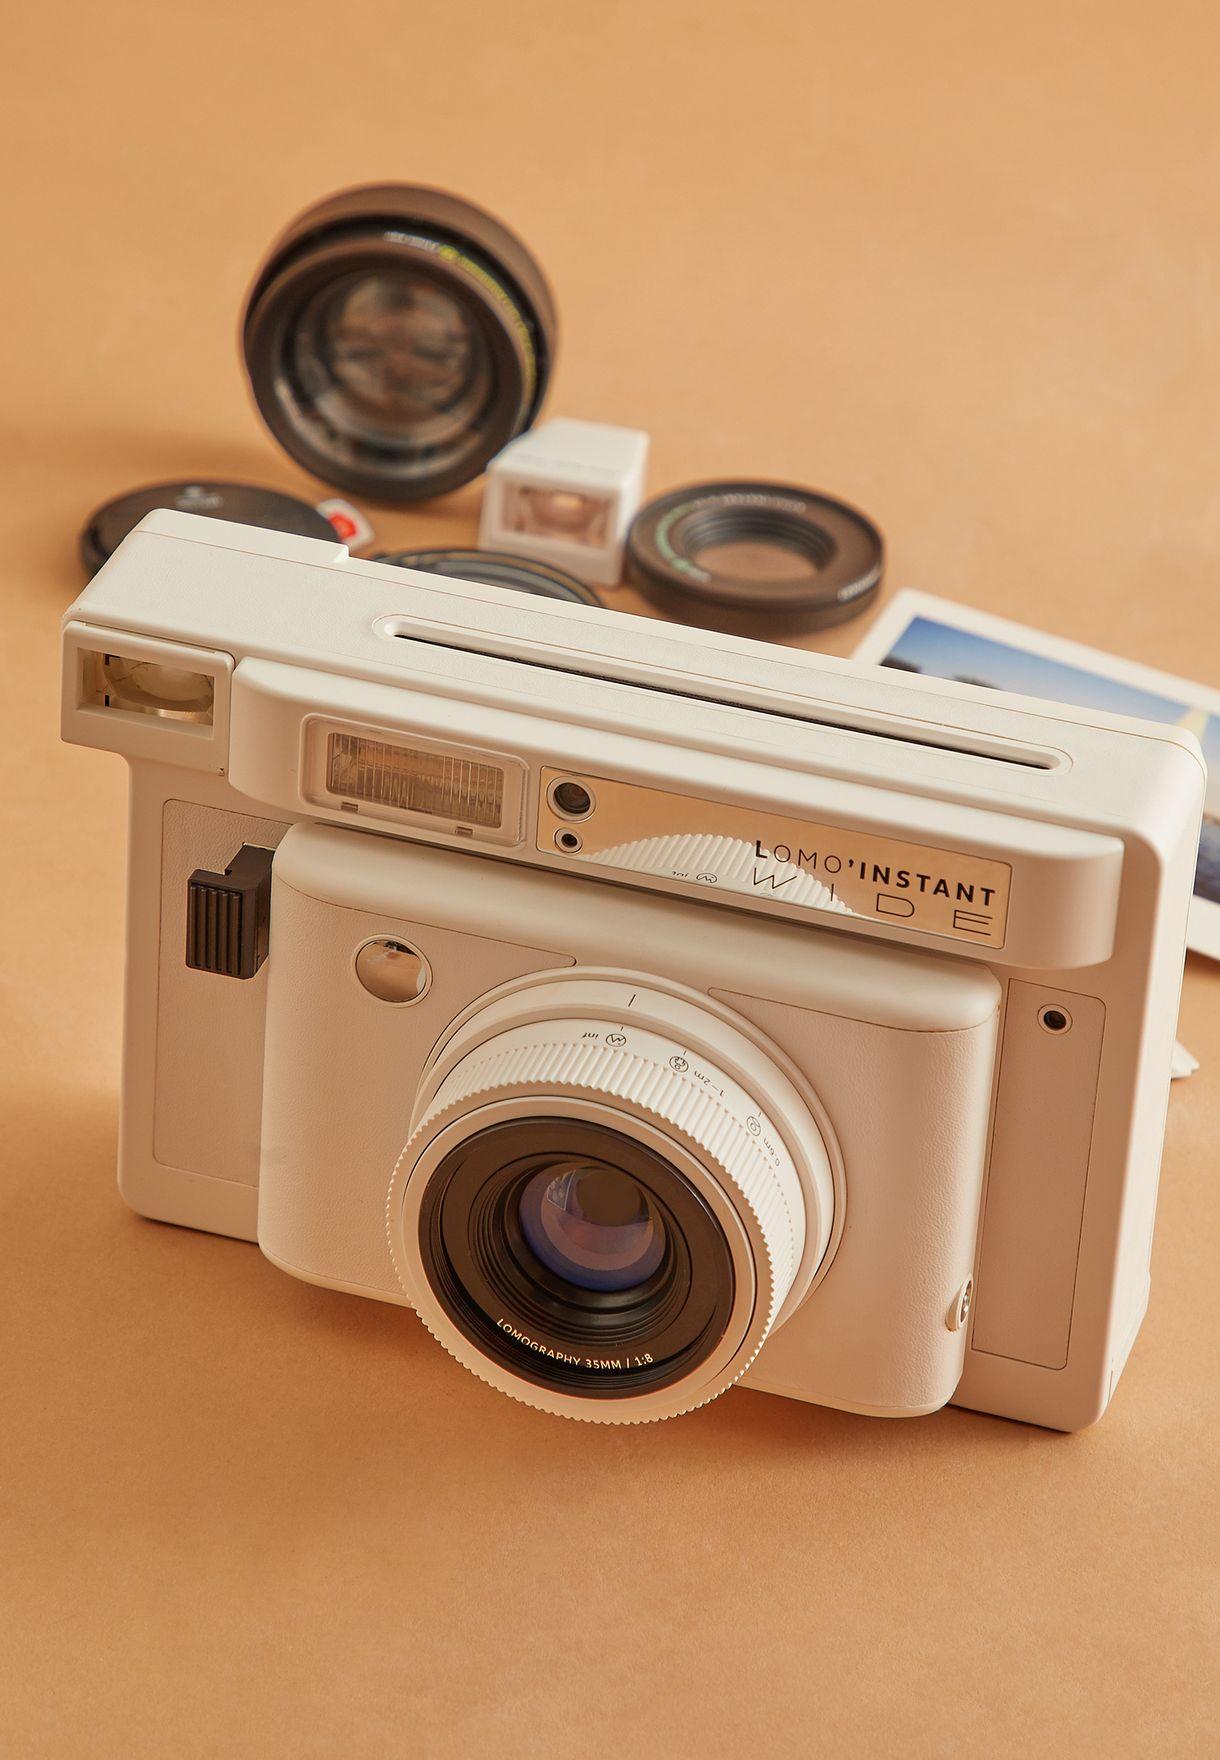 كاميرا لومو انستانت وايد كومبو مع عدسات وفيلم